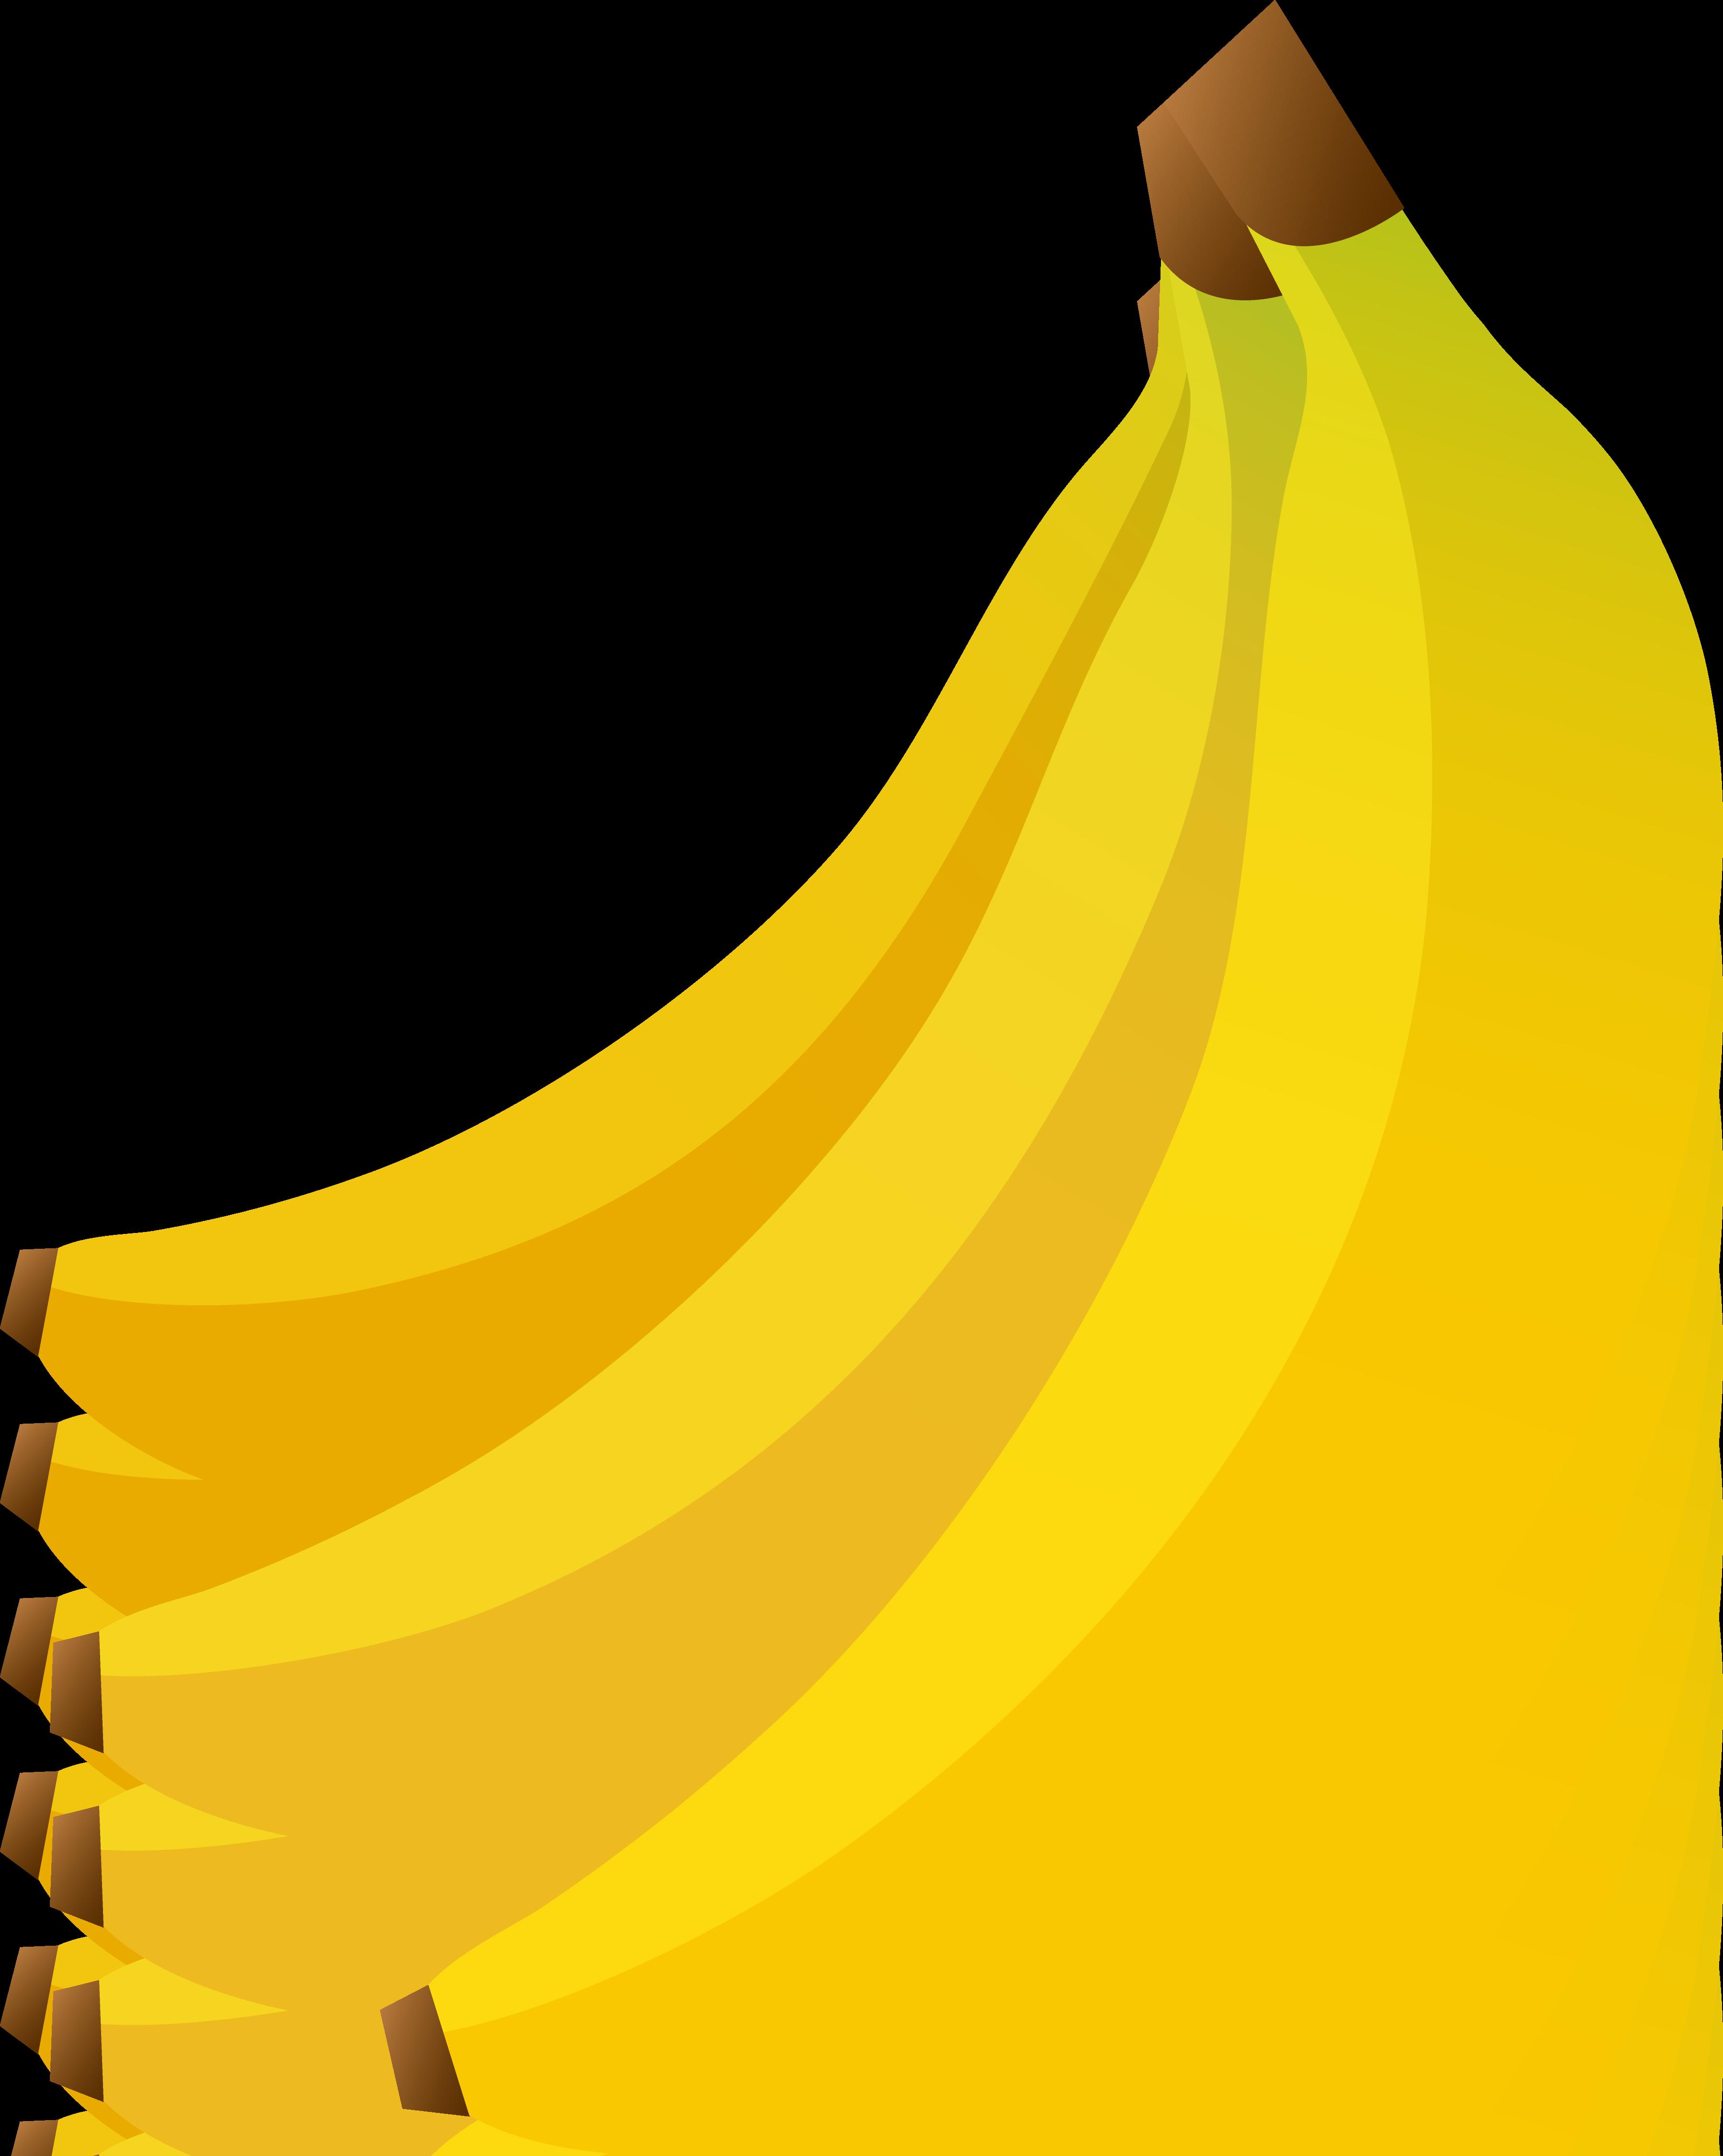 Bunch of bananas free. Banana clipart three